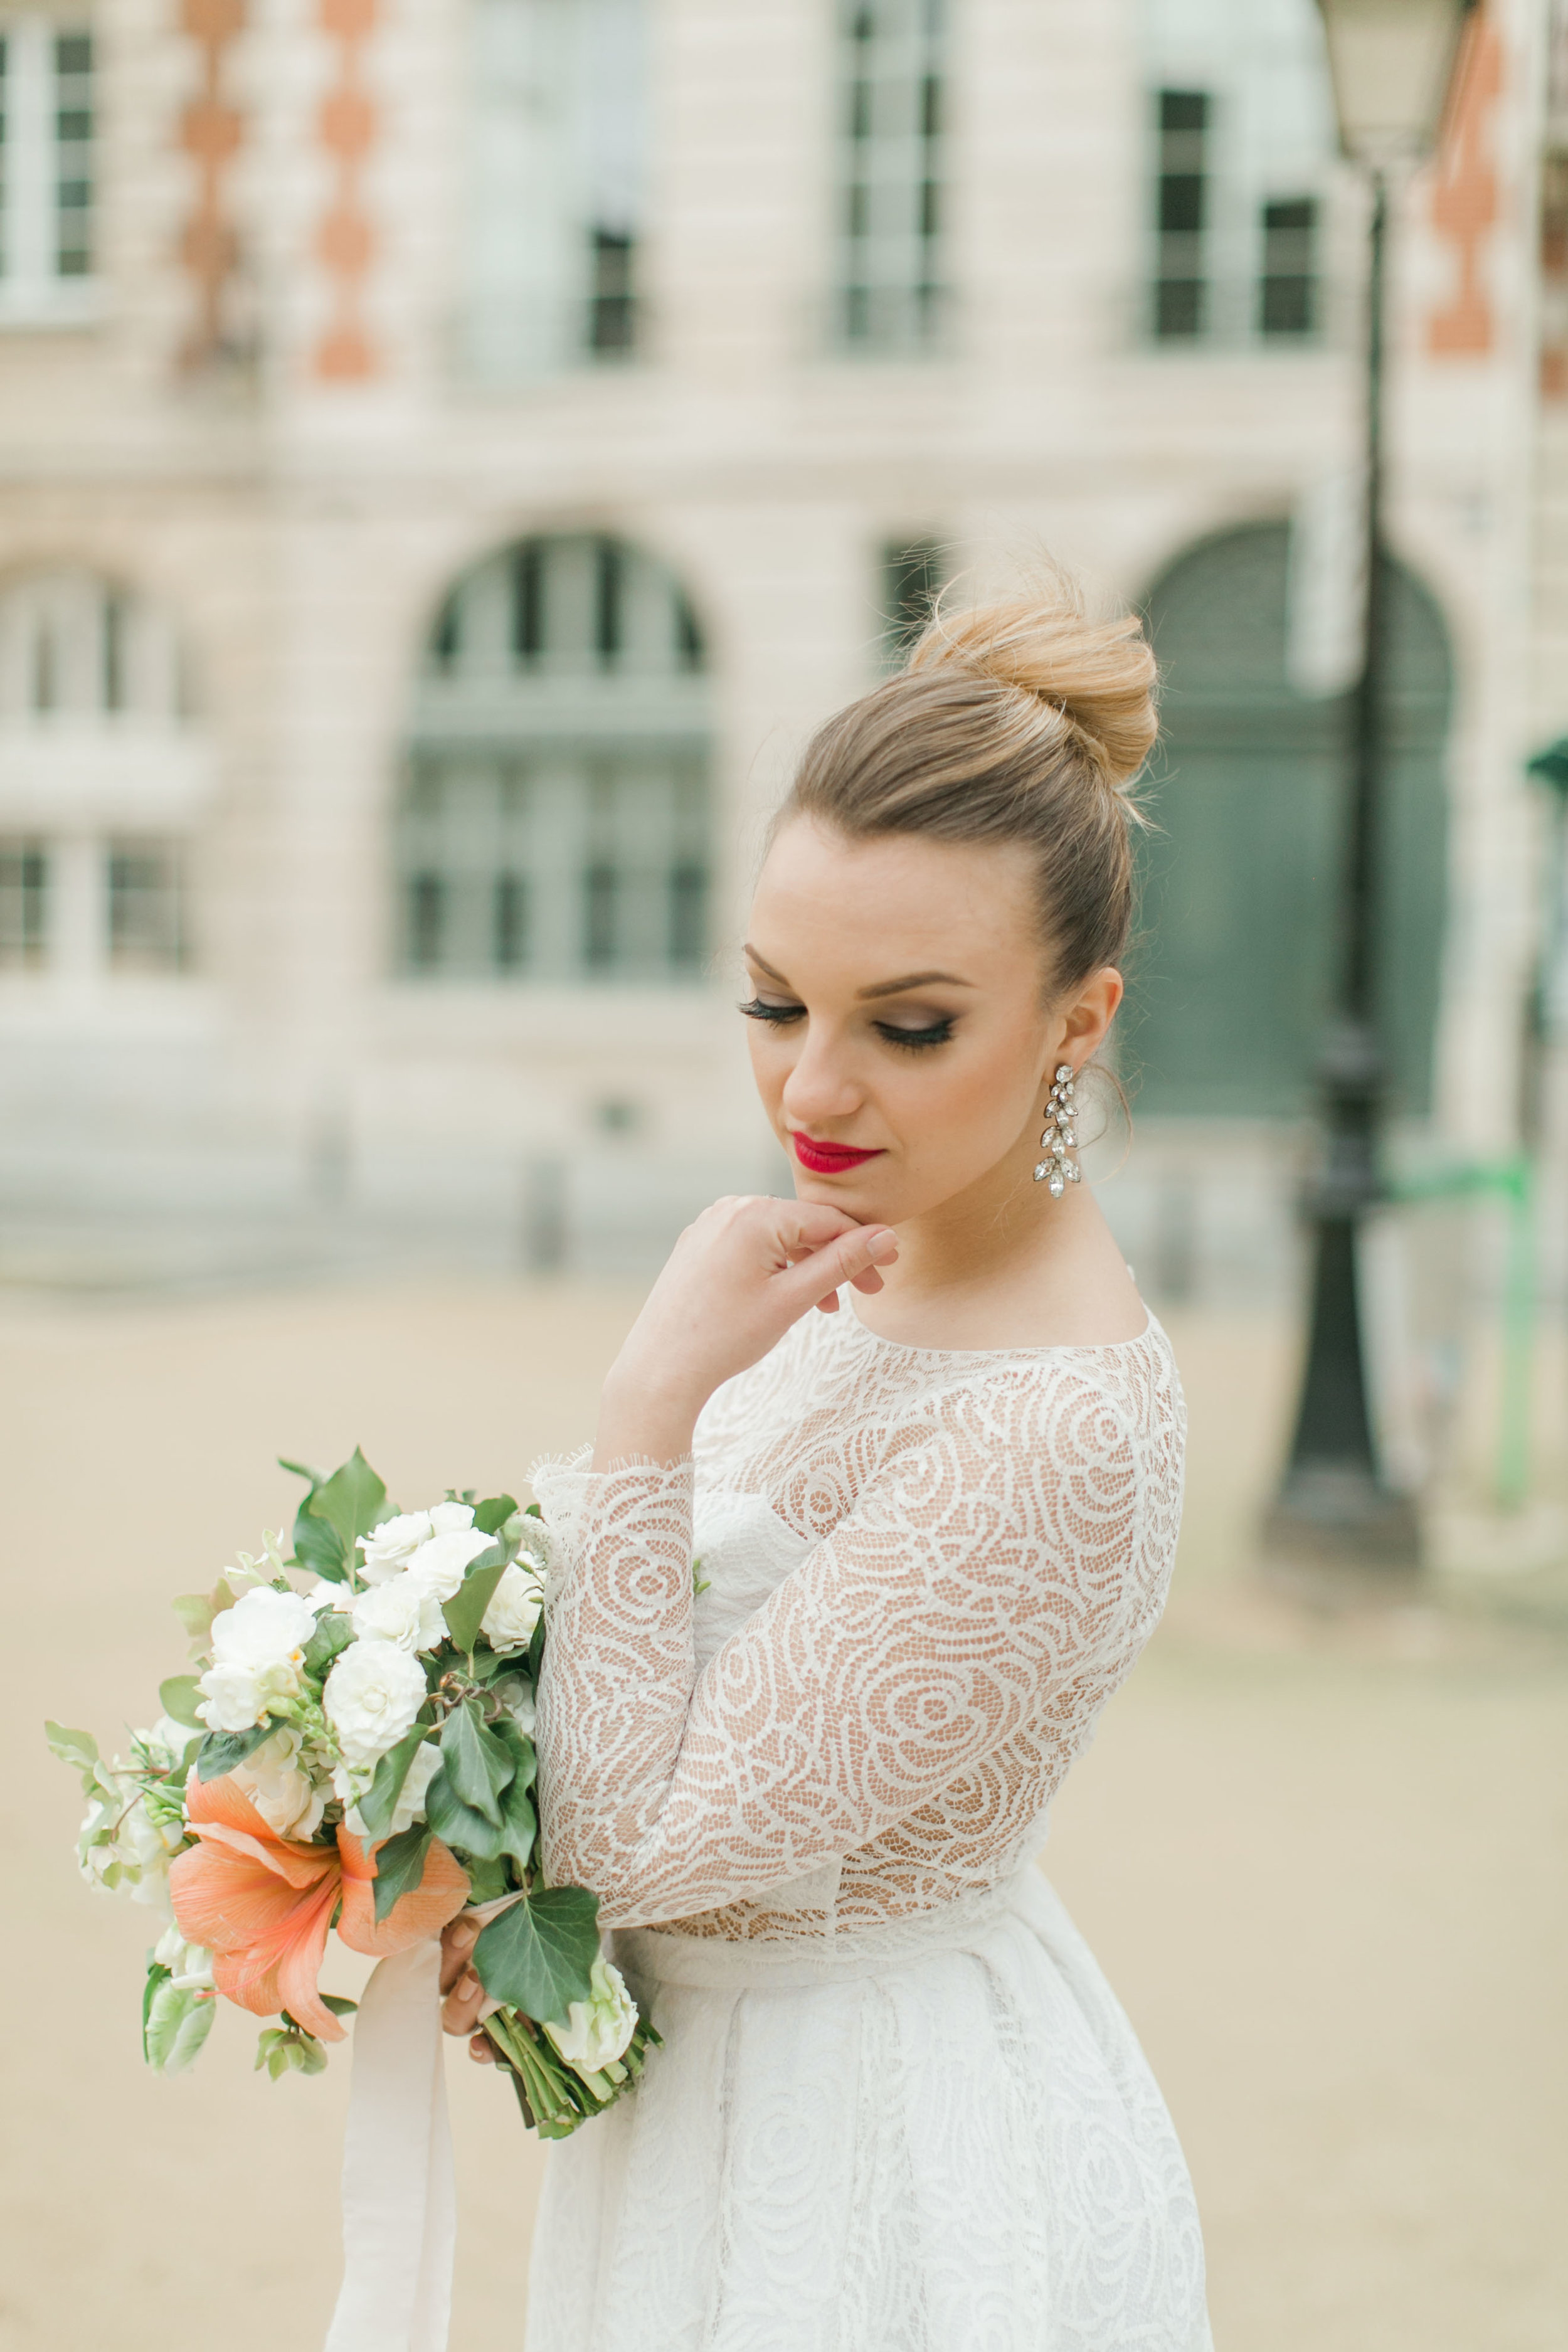 toronto-wedding-photographer-richelle-hunter-photography-new-york-paris-france-inspiration-56.jpg